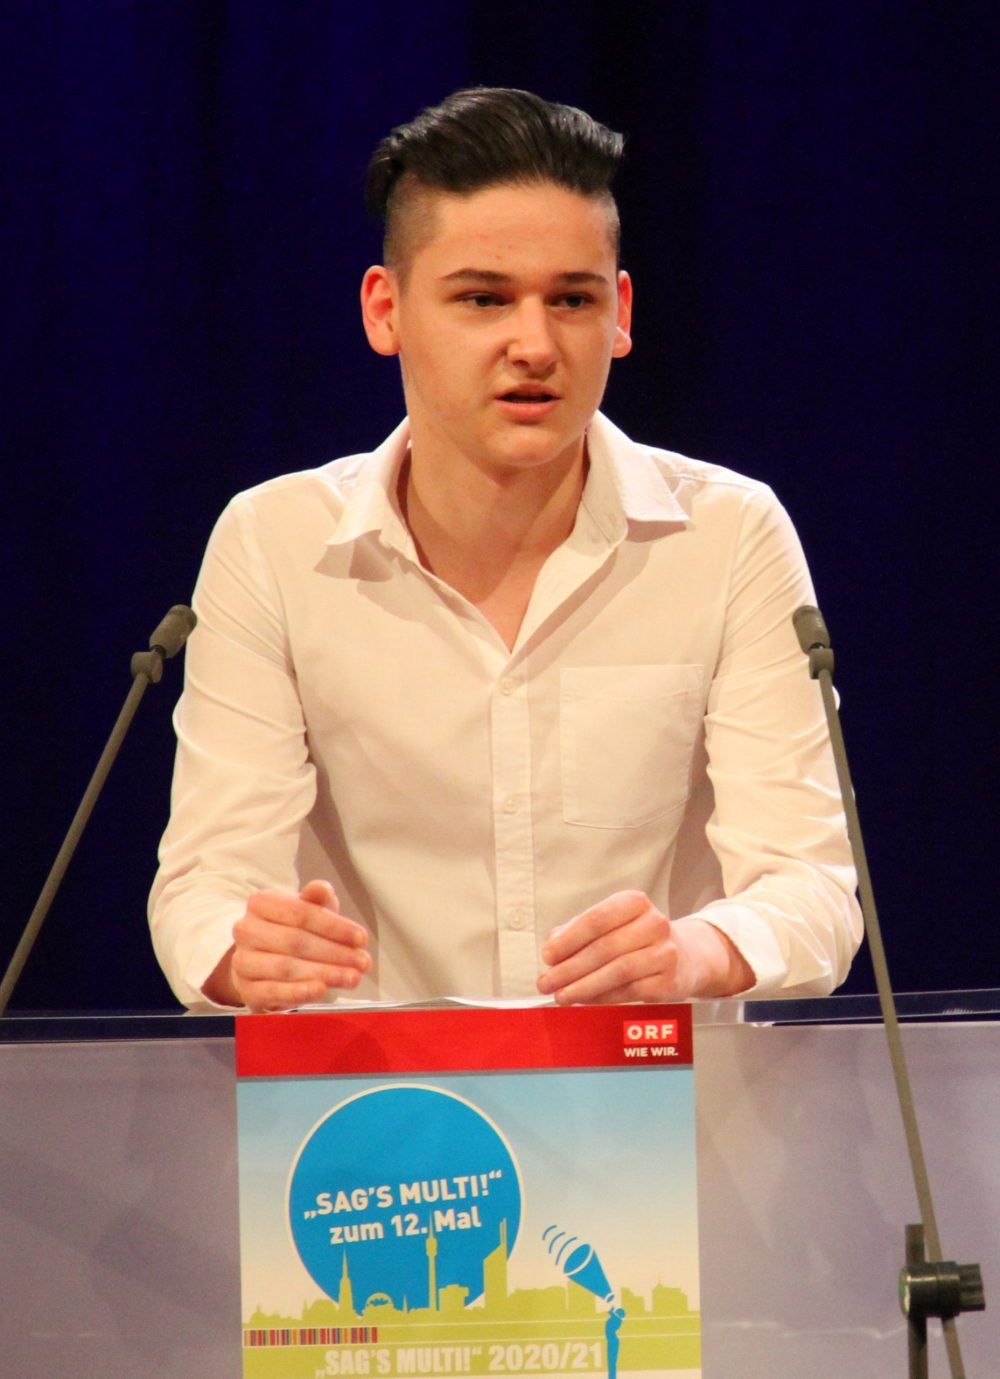 Jugendlicher am Redepult: Nemanja Stracenski